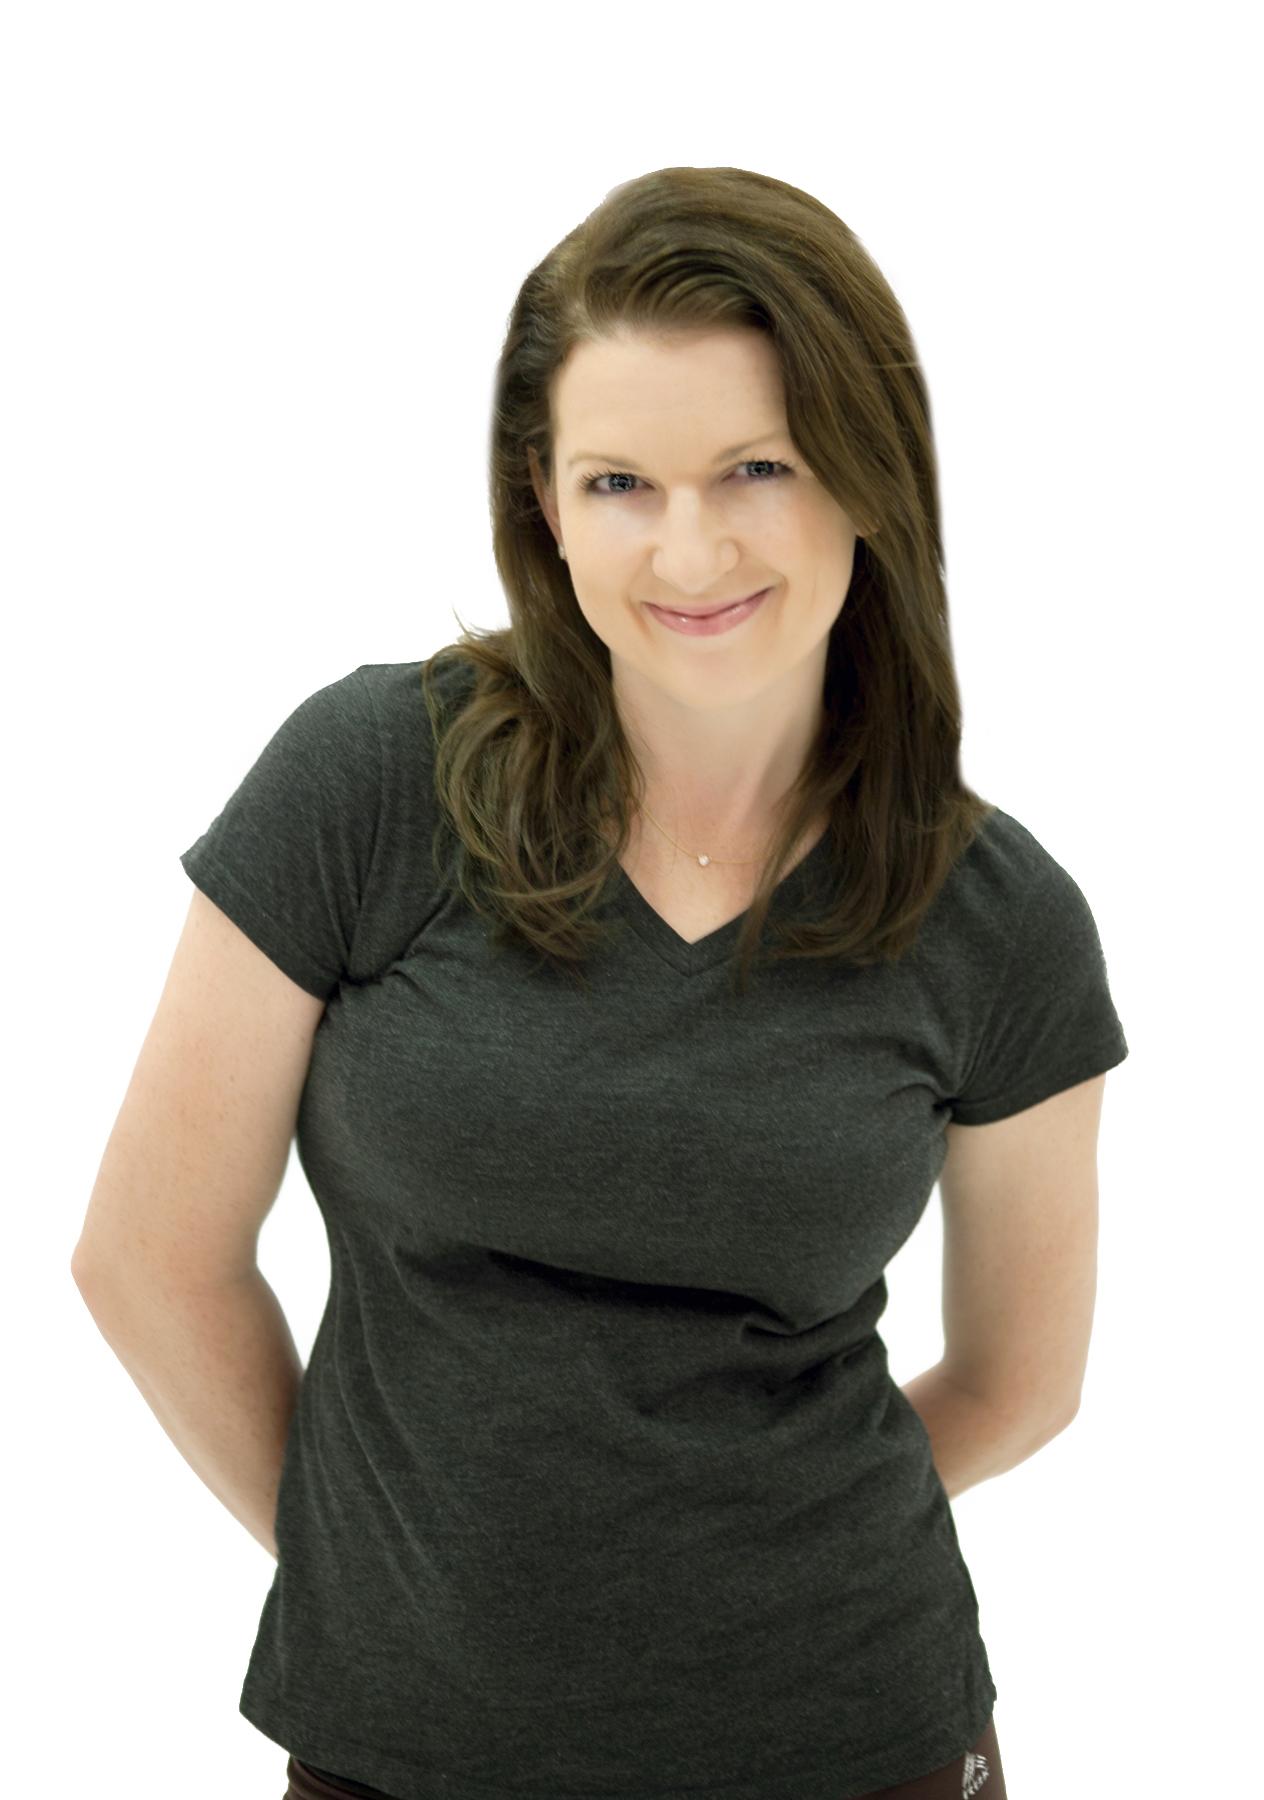 Ms. Abby Stevanus